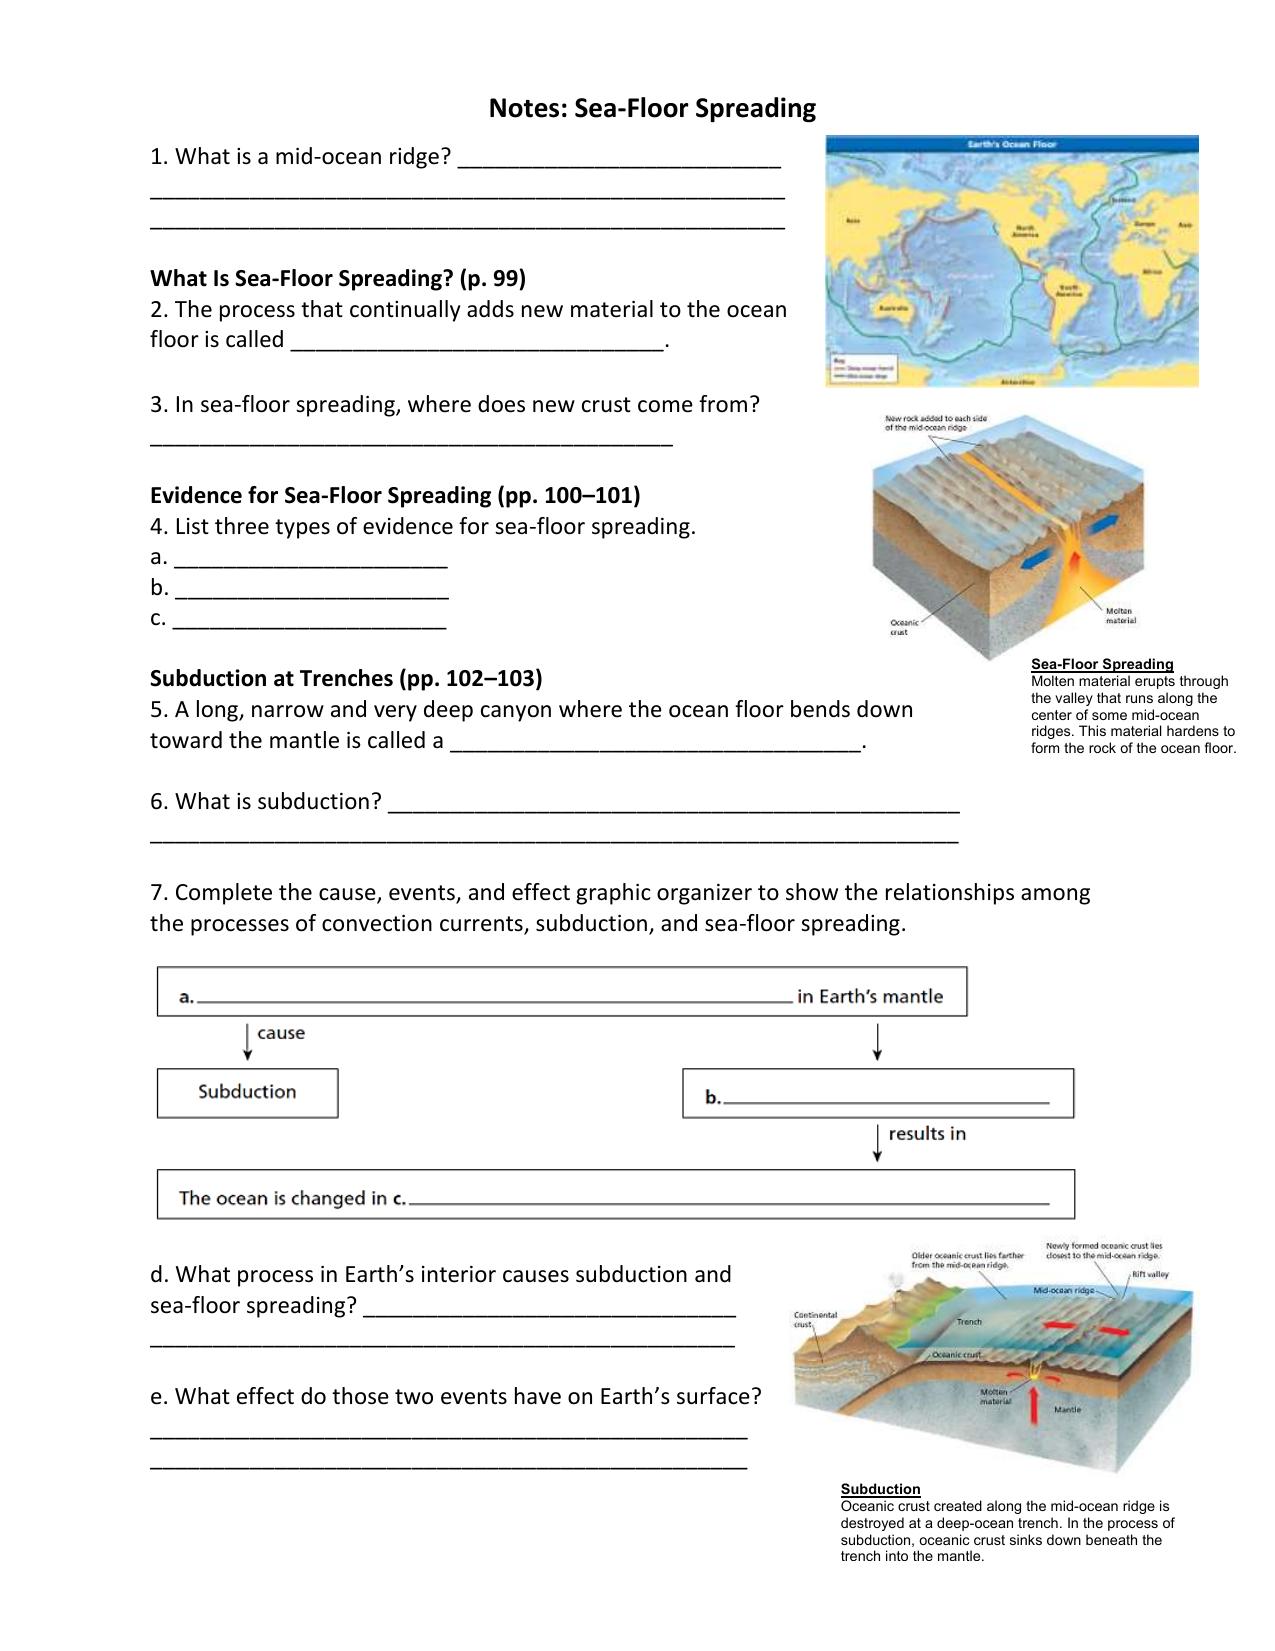 Ch. 3 Lesson 4 Notes-Sea Floor Spreading